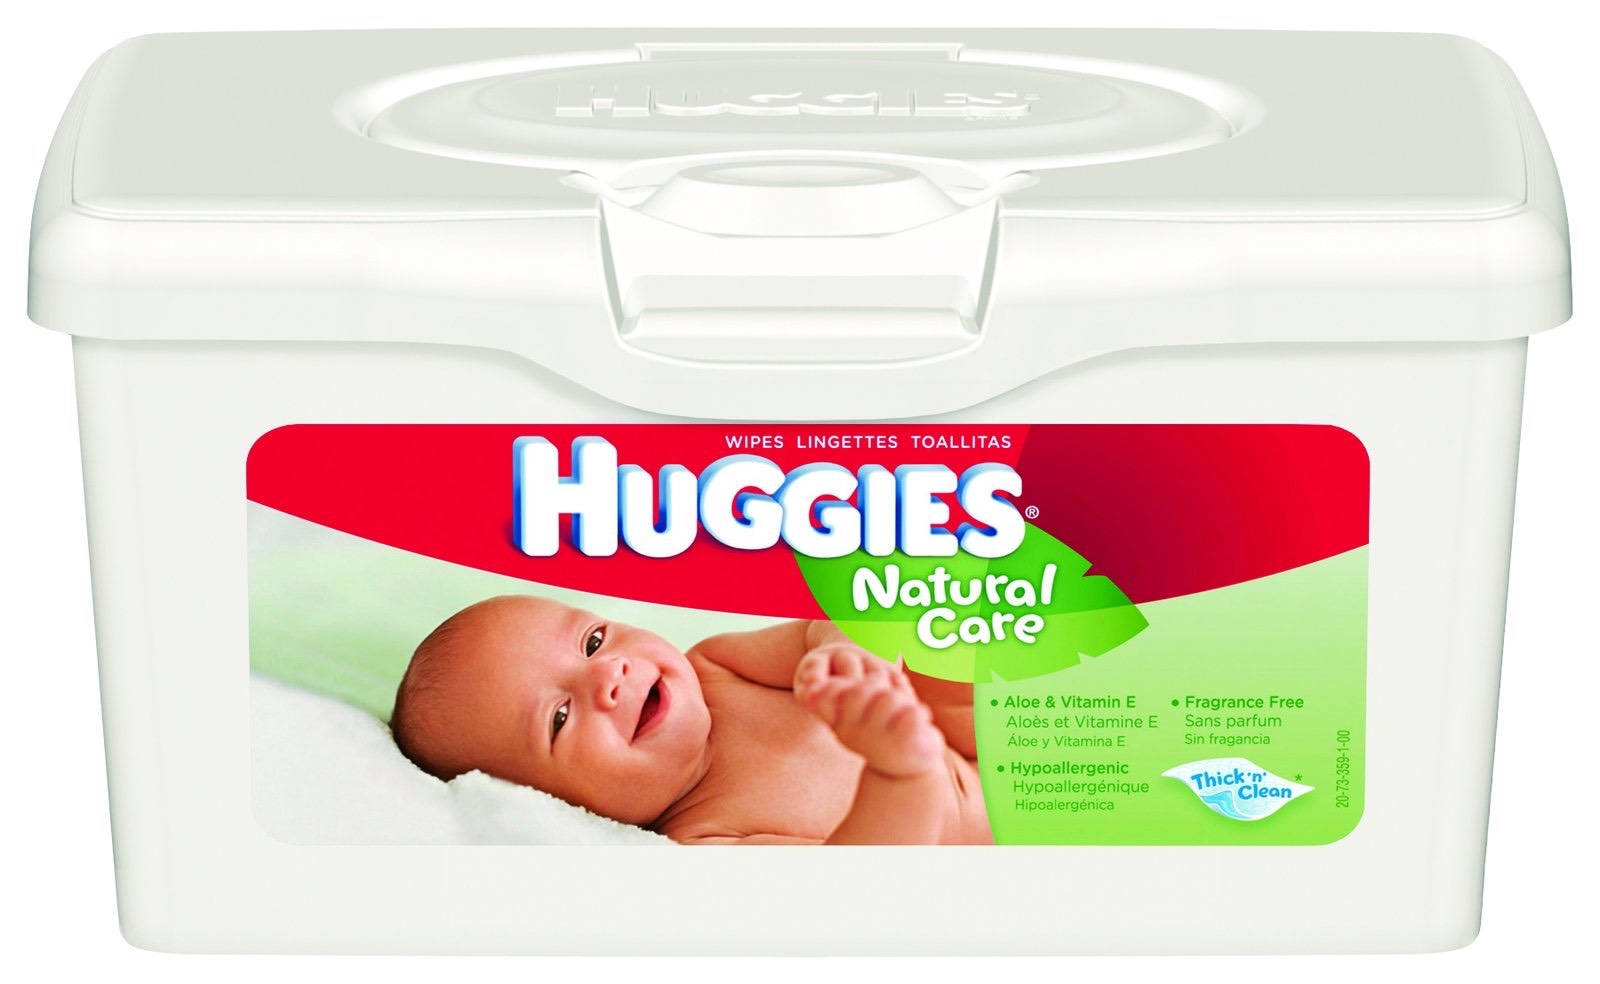 *HOT* Walgreens: FREE Huggies Natural Care Wipes!